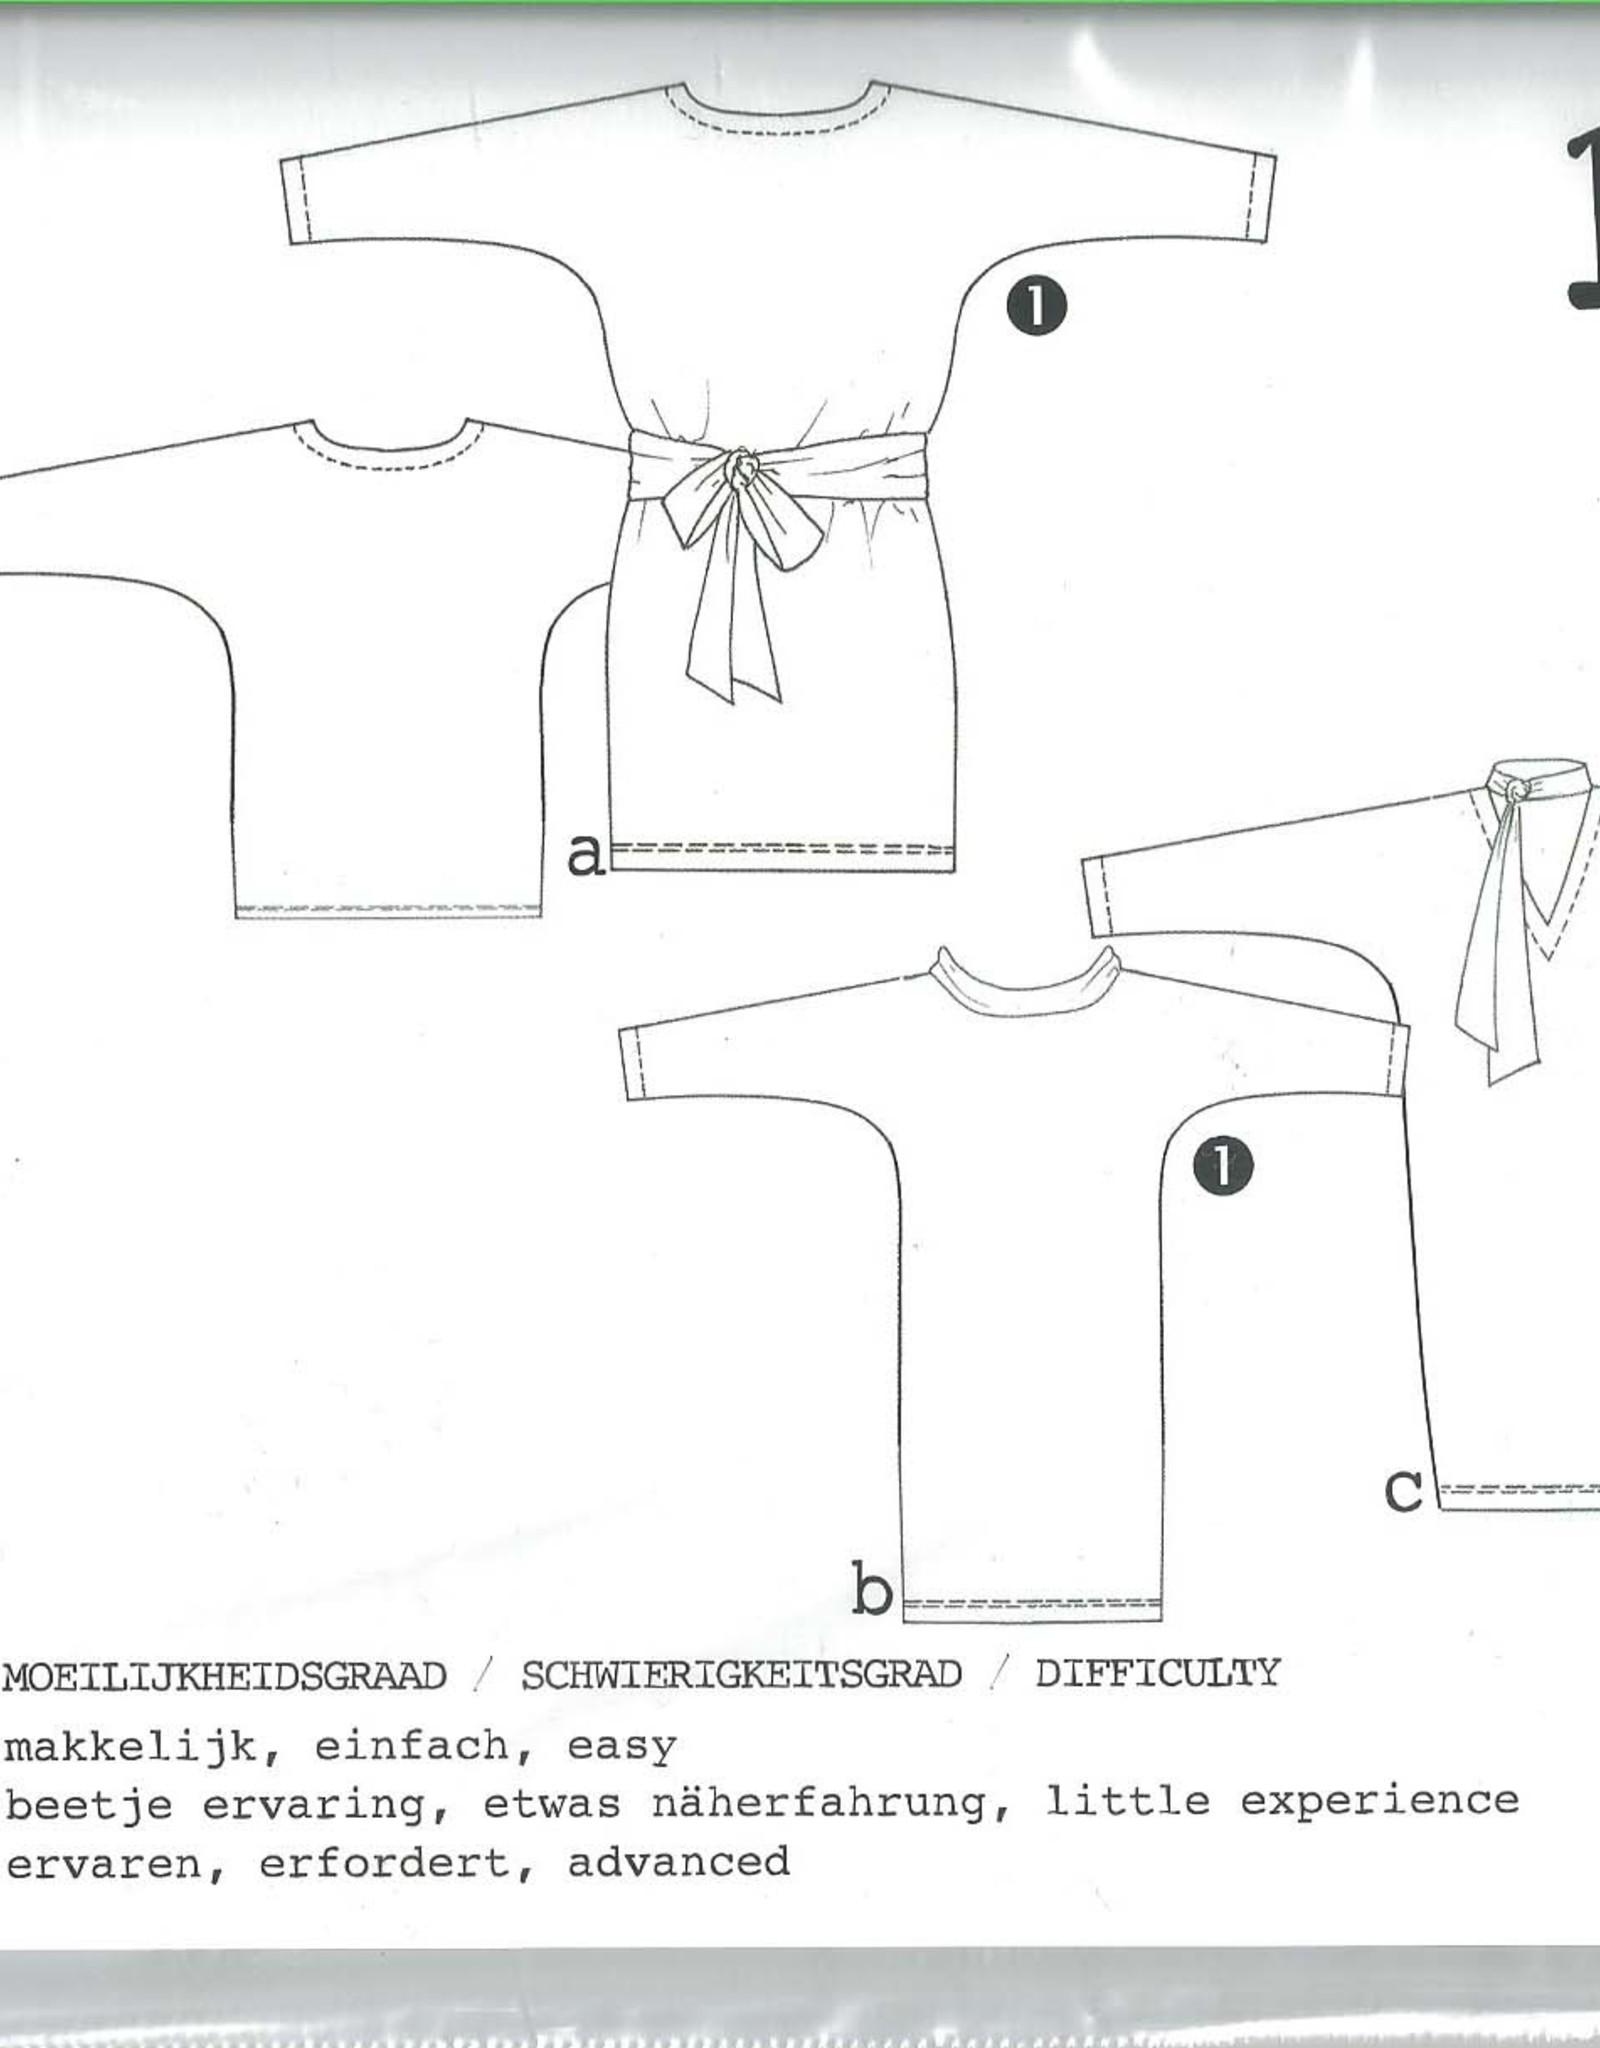 It's A fits Jurkjes, shirt 1098 - It's A fits